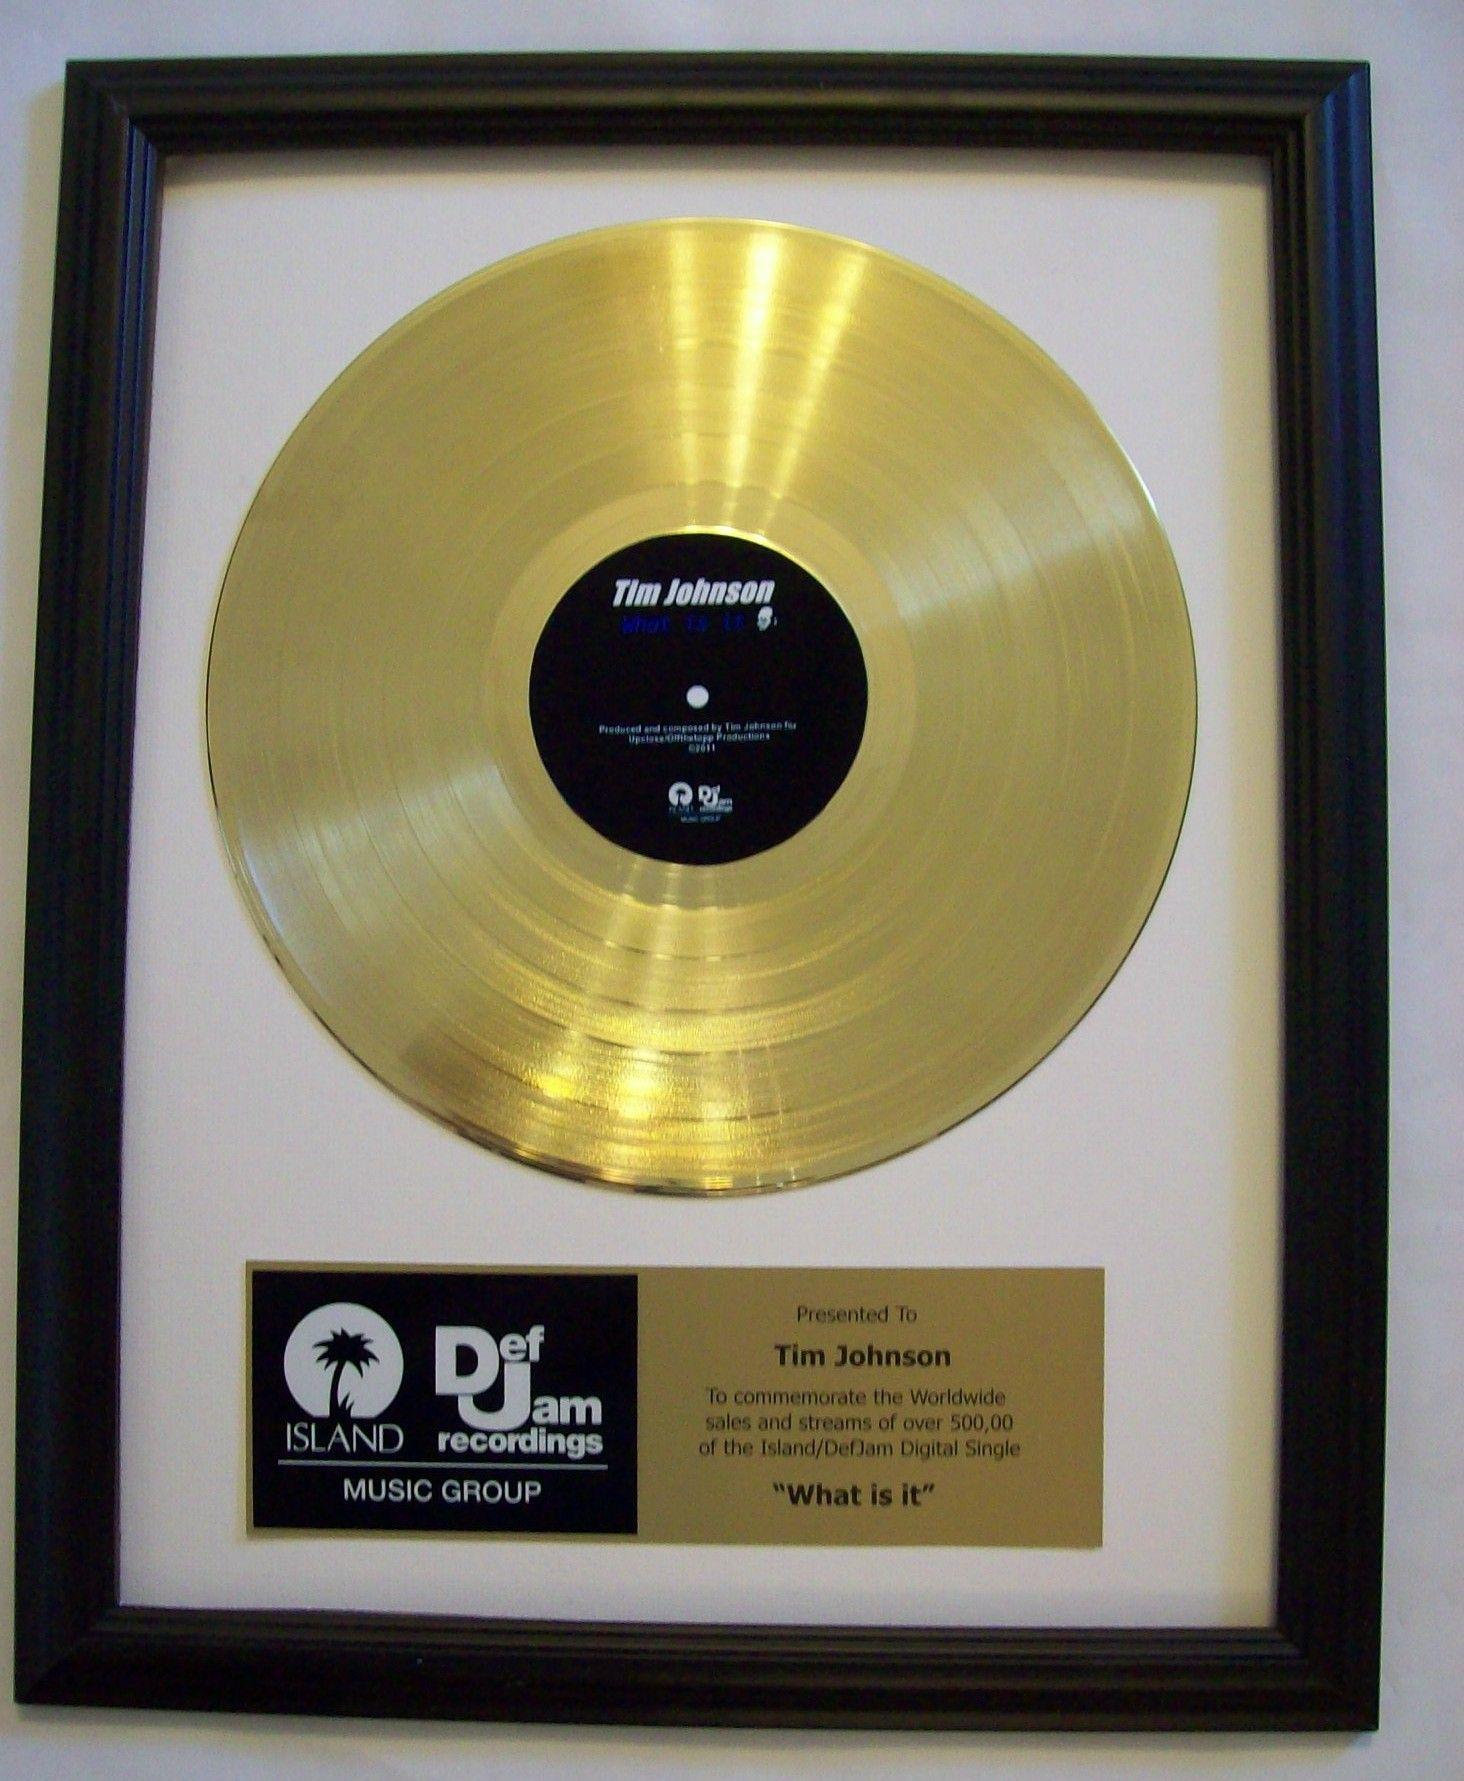 Gold Lp Record Trophy Award In 2020 Custom Plaques Custom Awards Company Logo Design